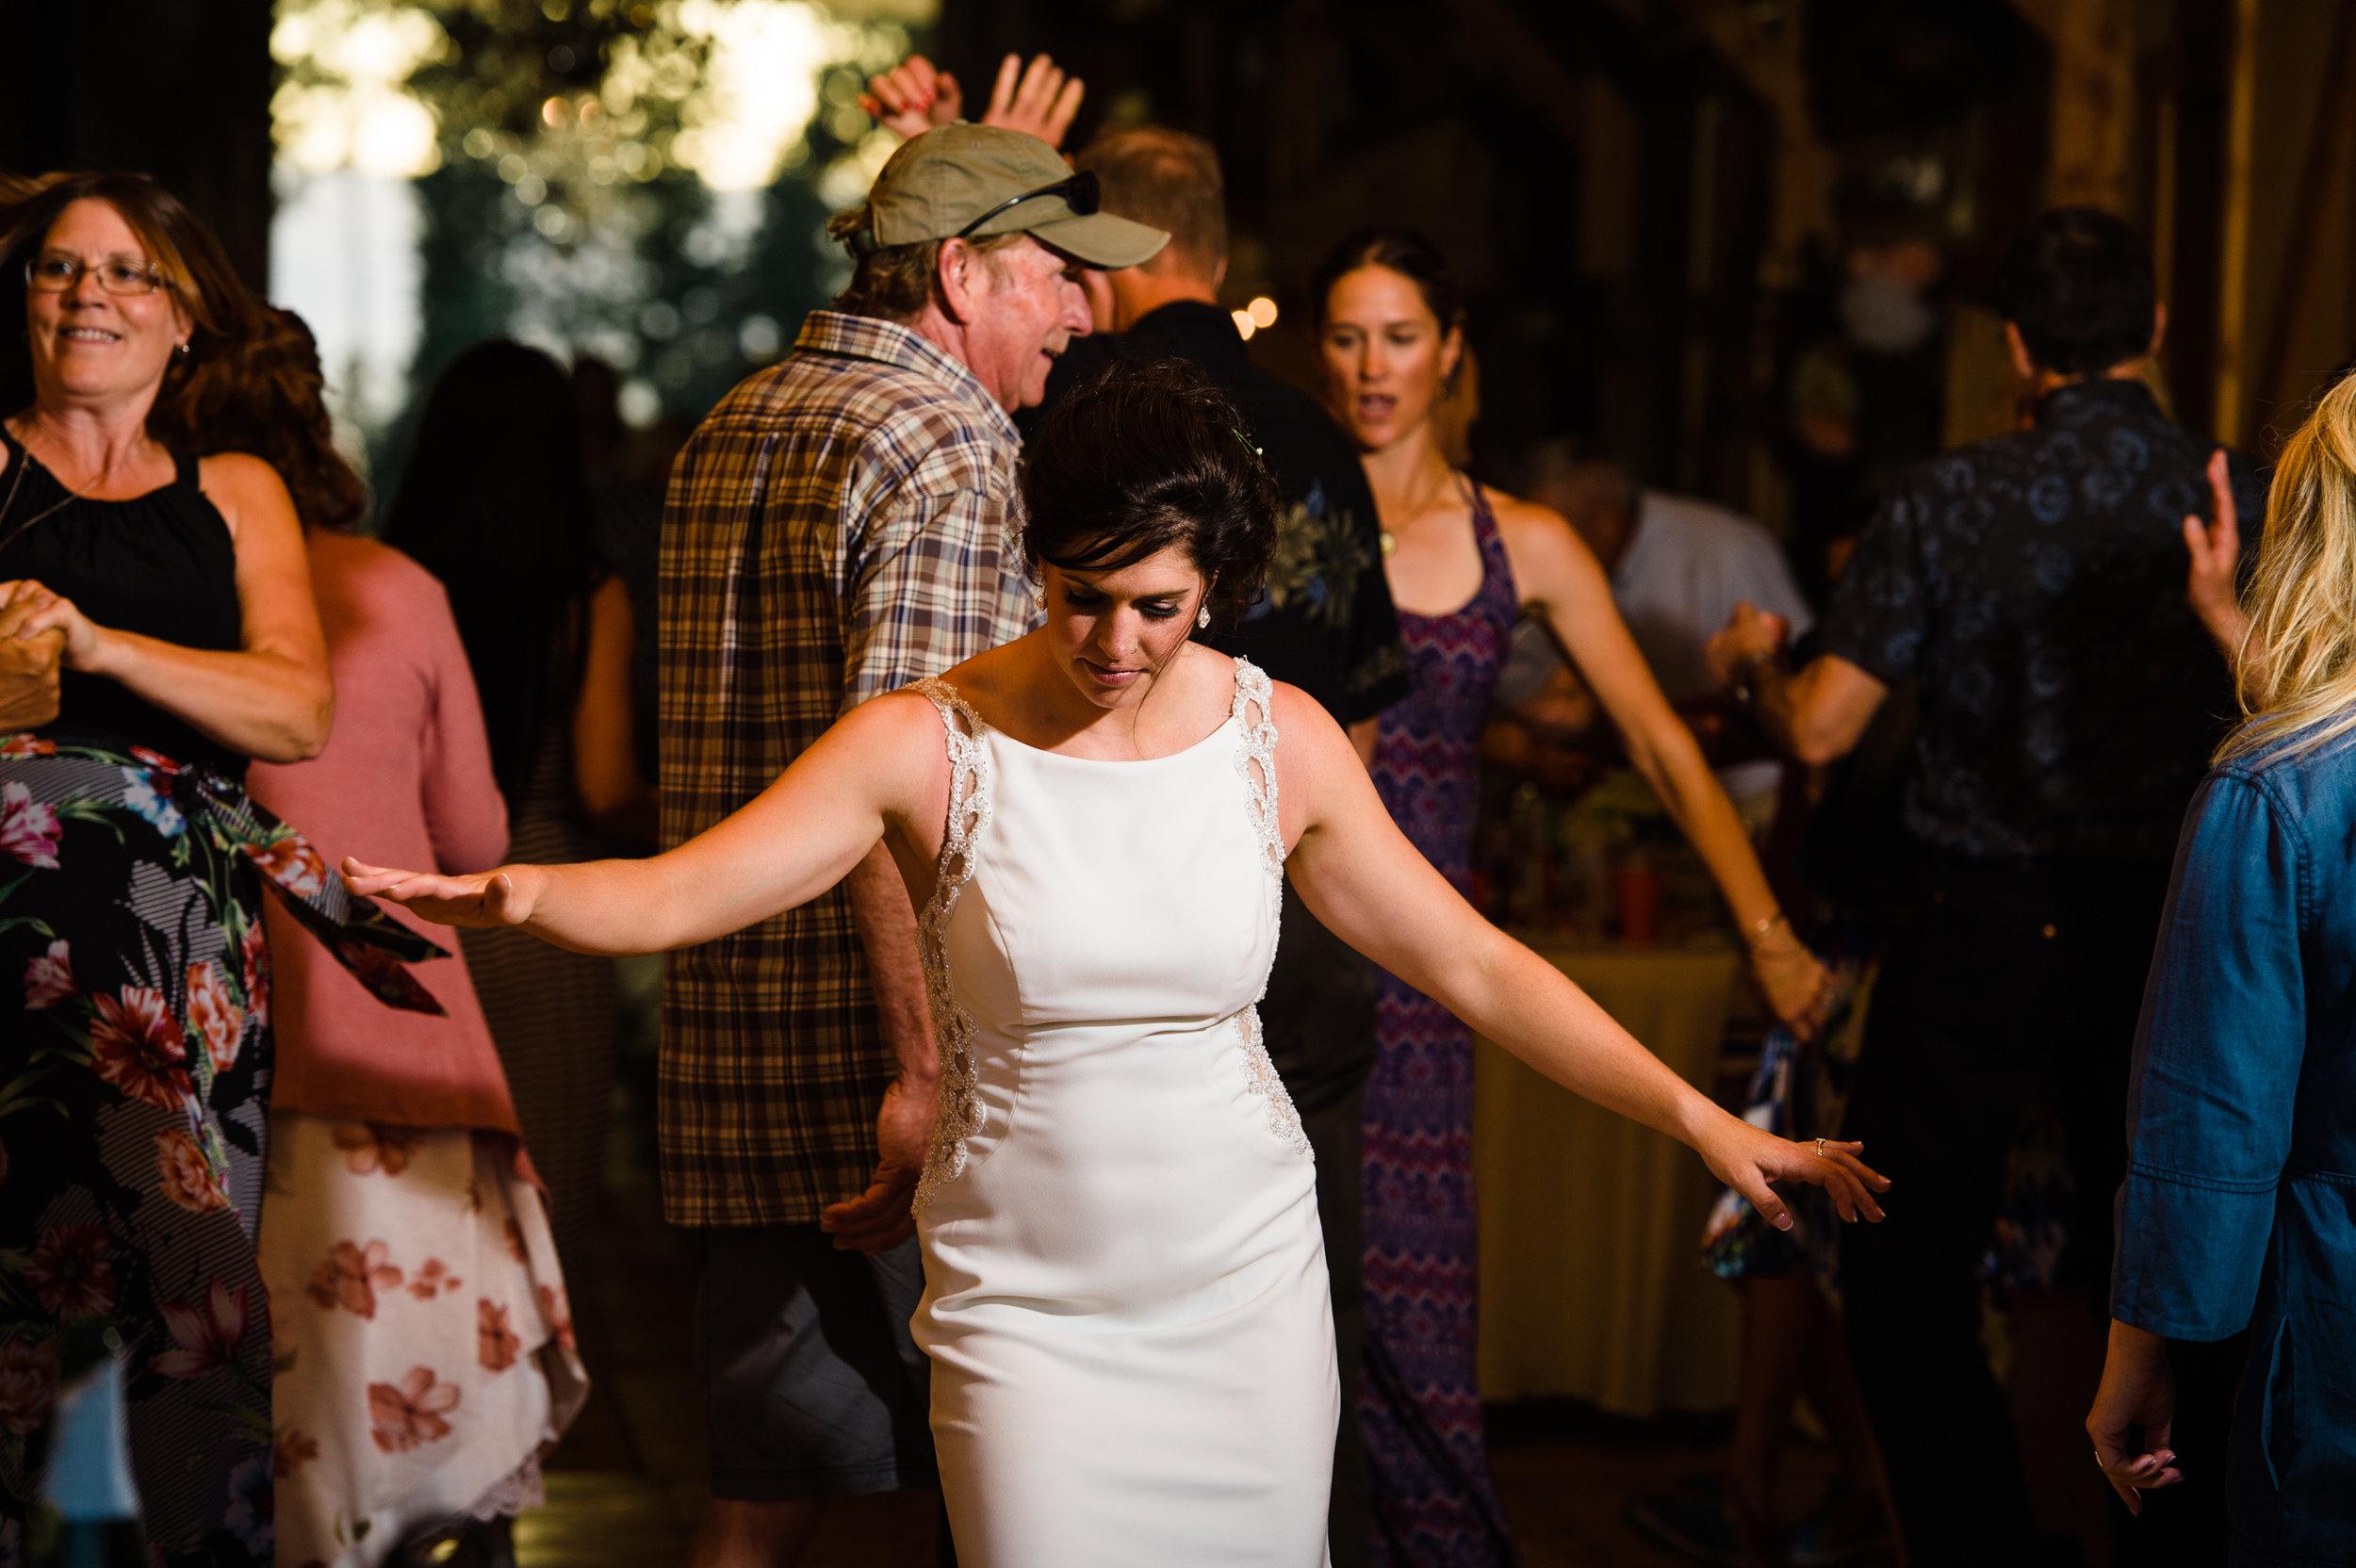 433The Barn at Finley Point Wedding_Montana Wedding Photographer_Katy & Bryce_July 20, 2019-1303.jpg